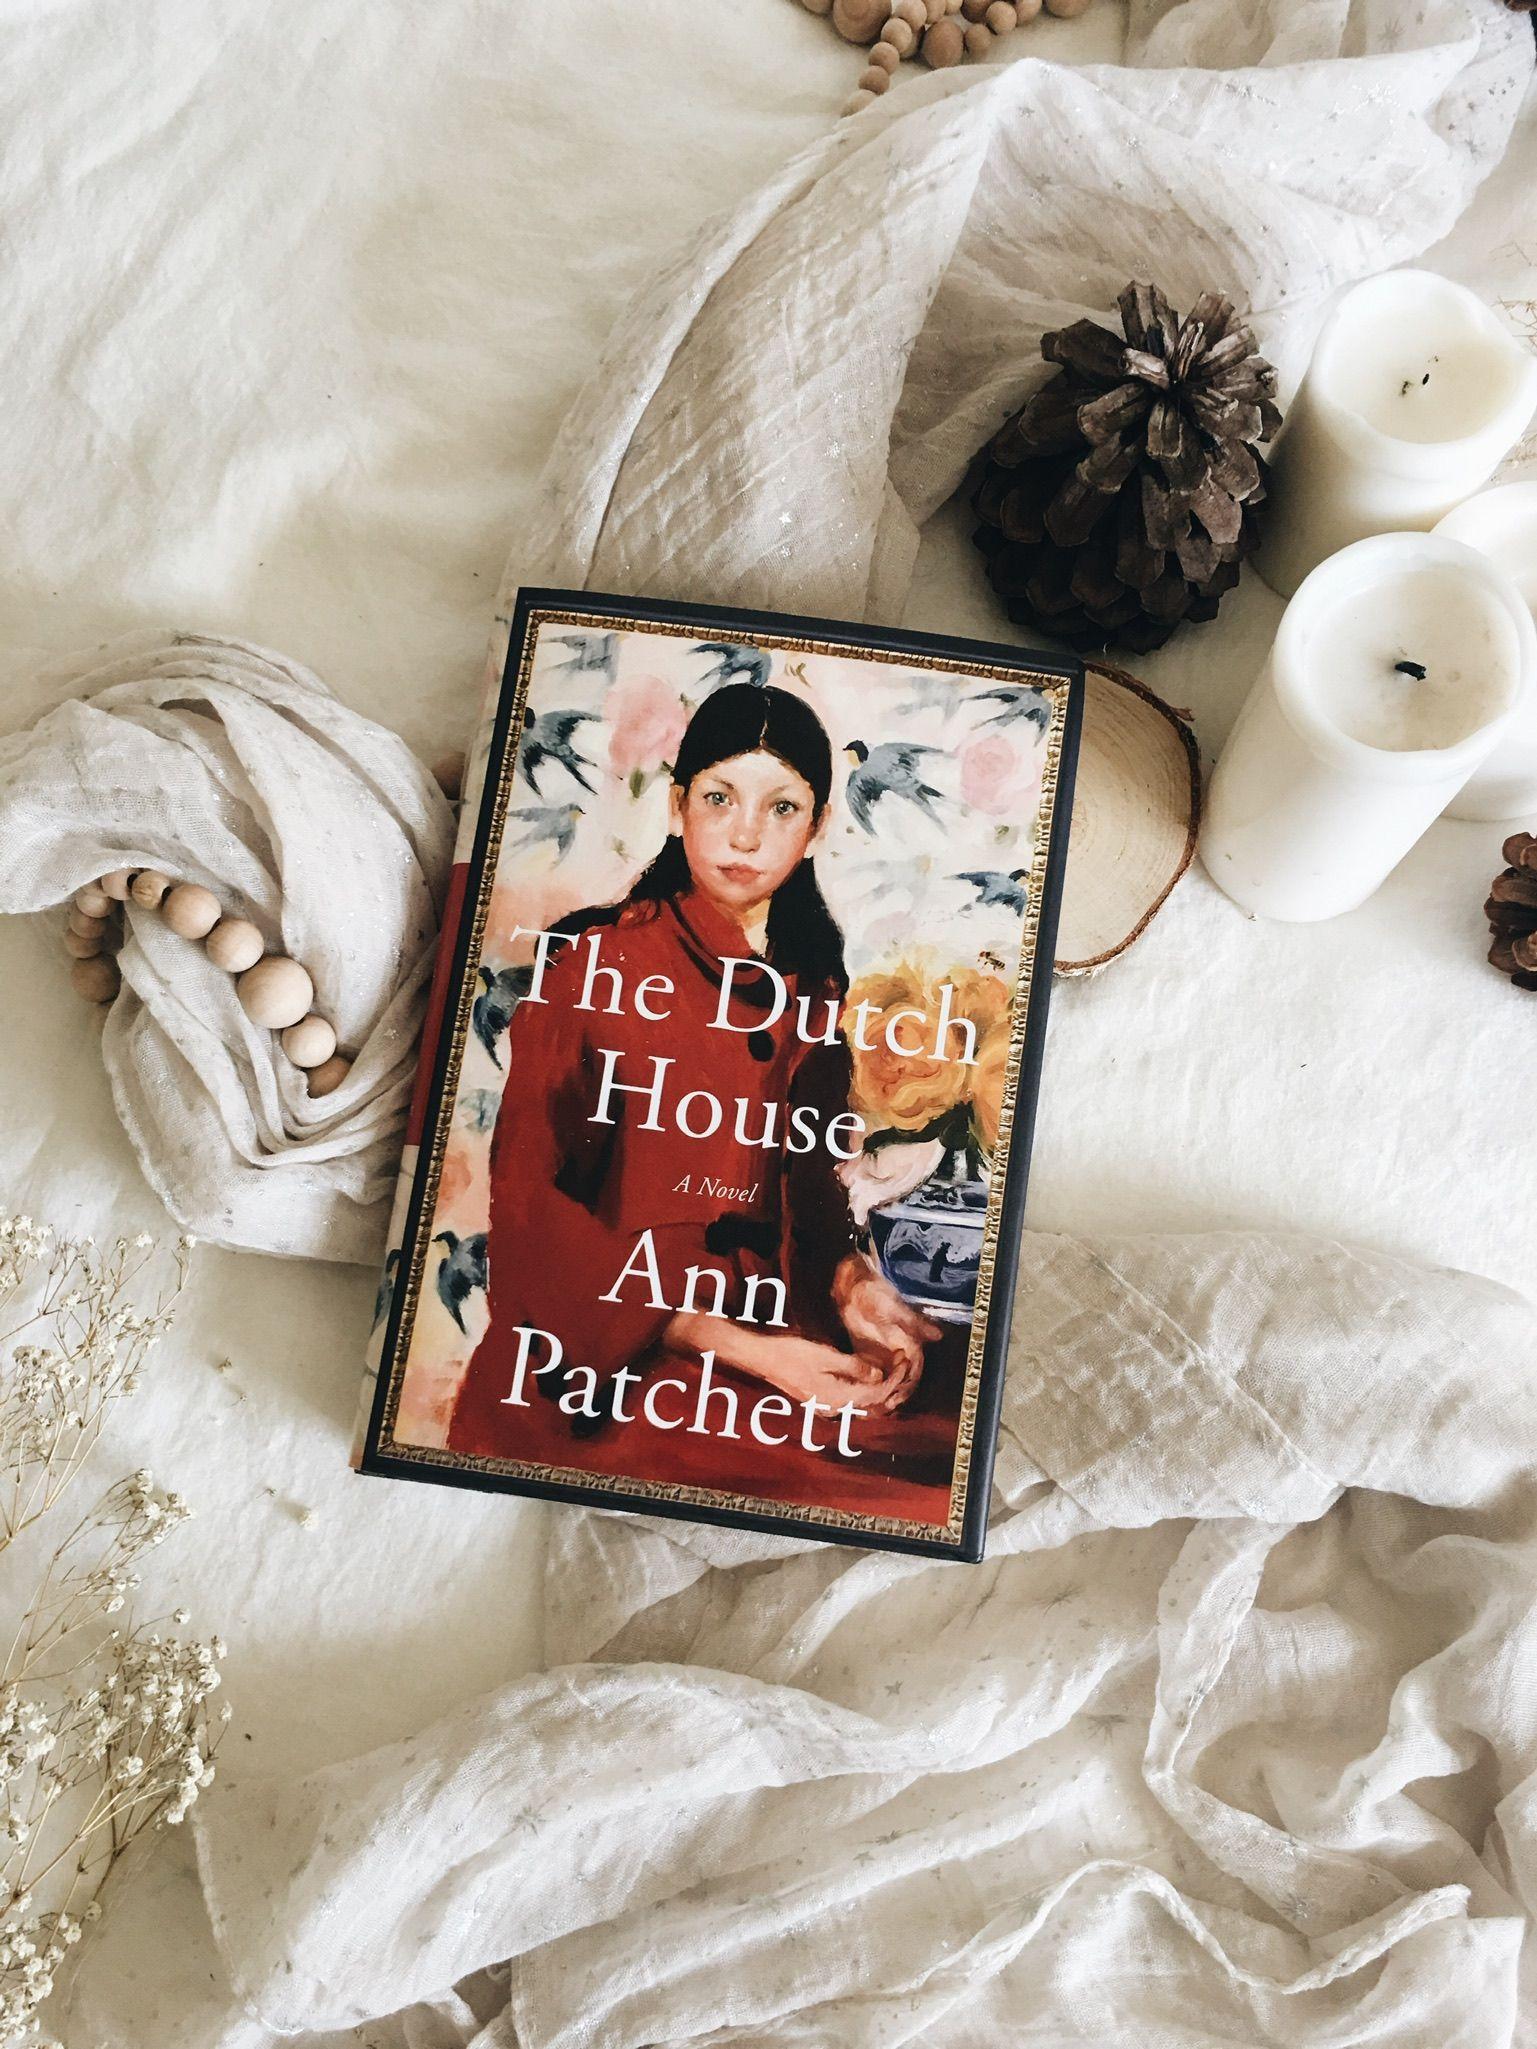 The Dutch House Ann Patchett Book Reviews Book Blog in